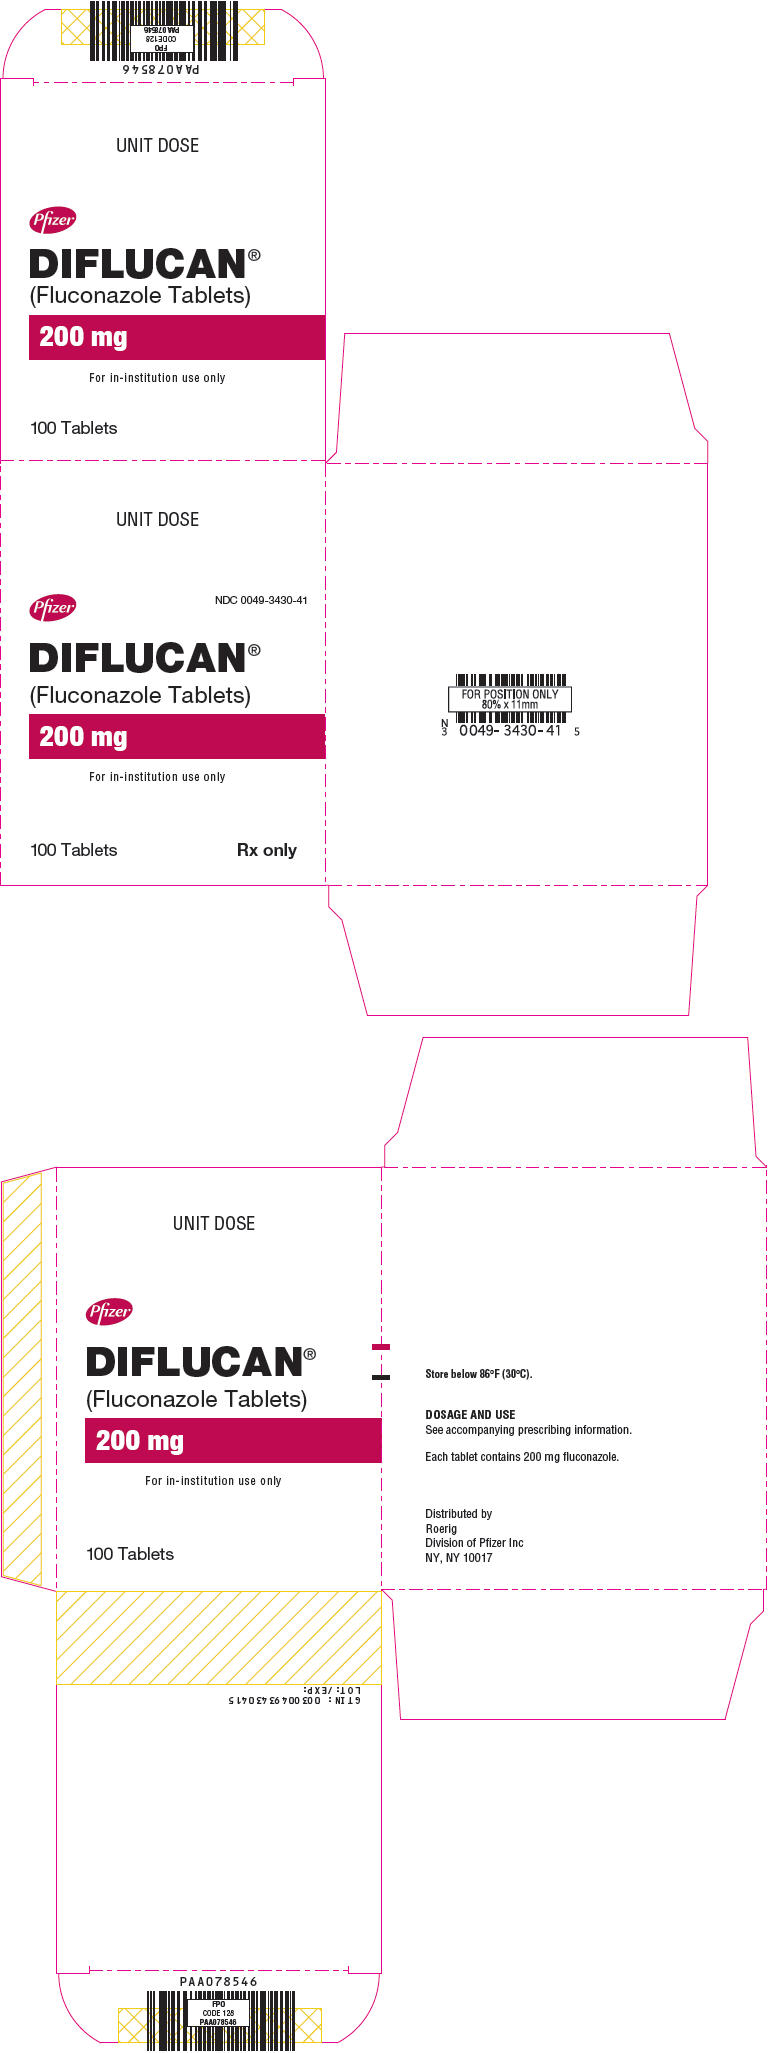 Principal Display Panel - 200 mg Tablet Blister Pack Carton